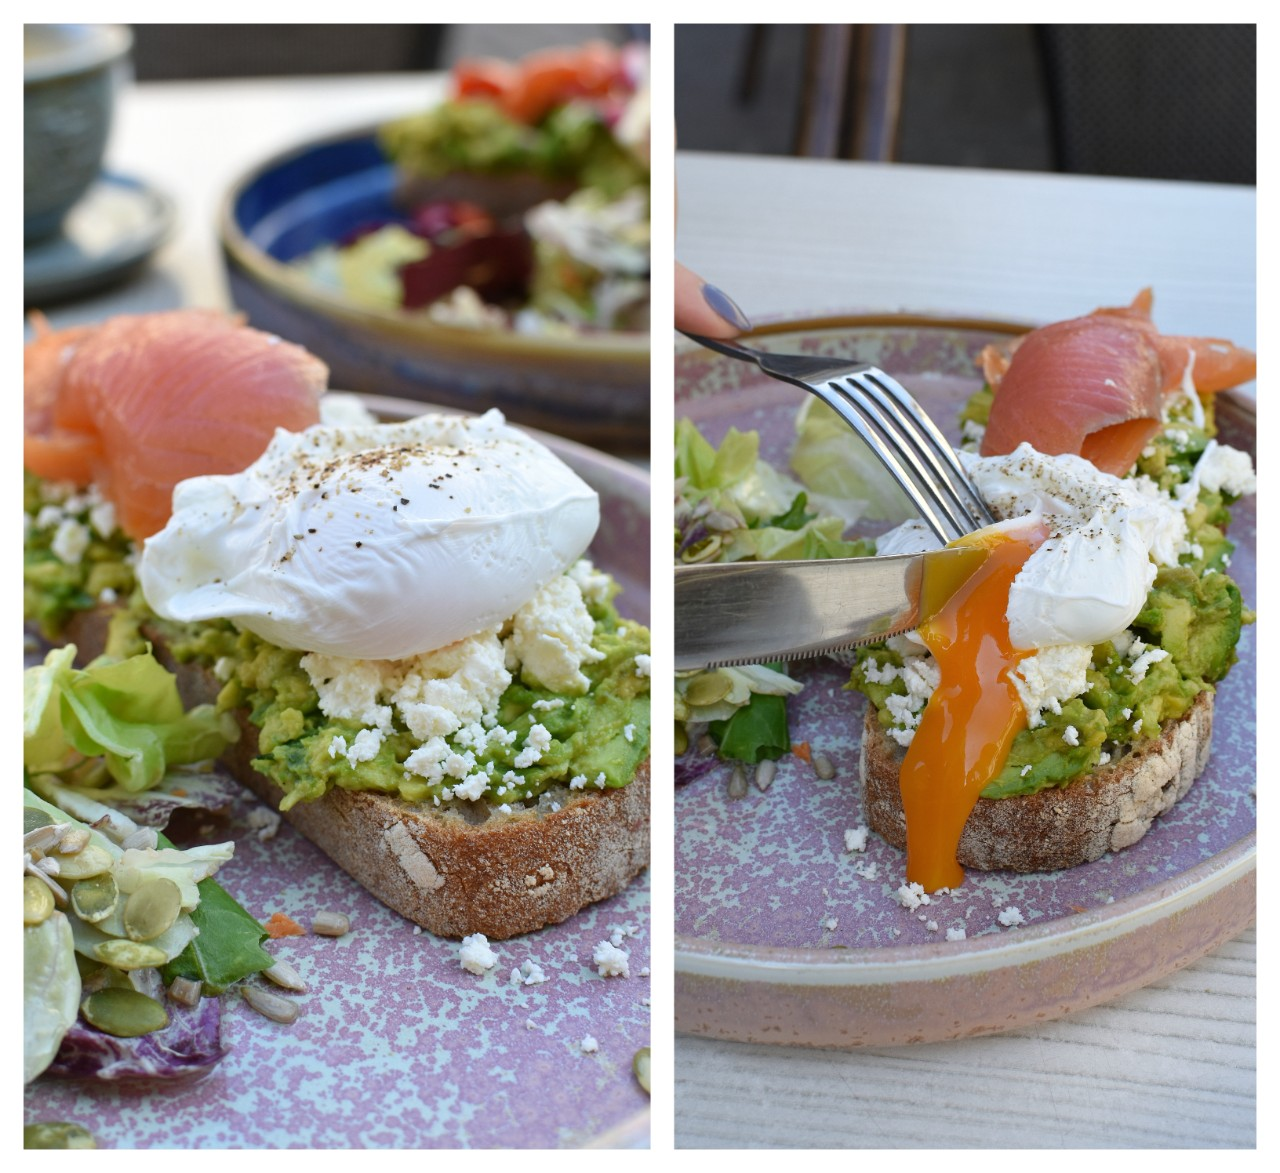 Toast ou posat, avocado, somon afumat -The Dripper Oradea